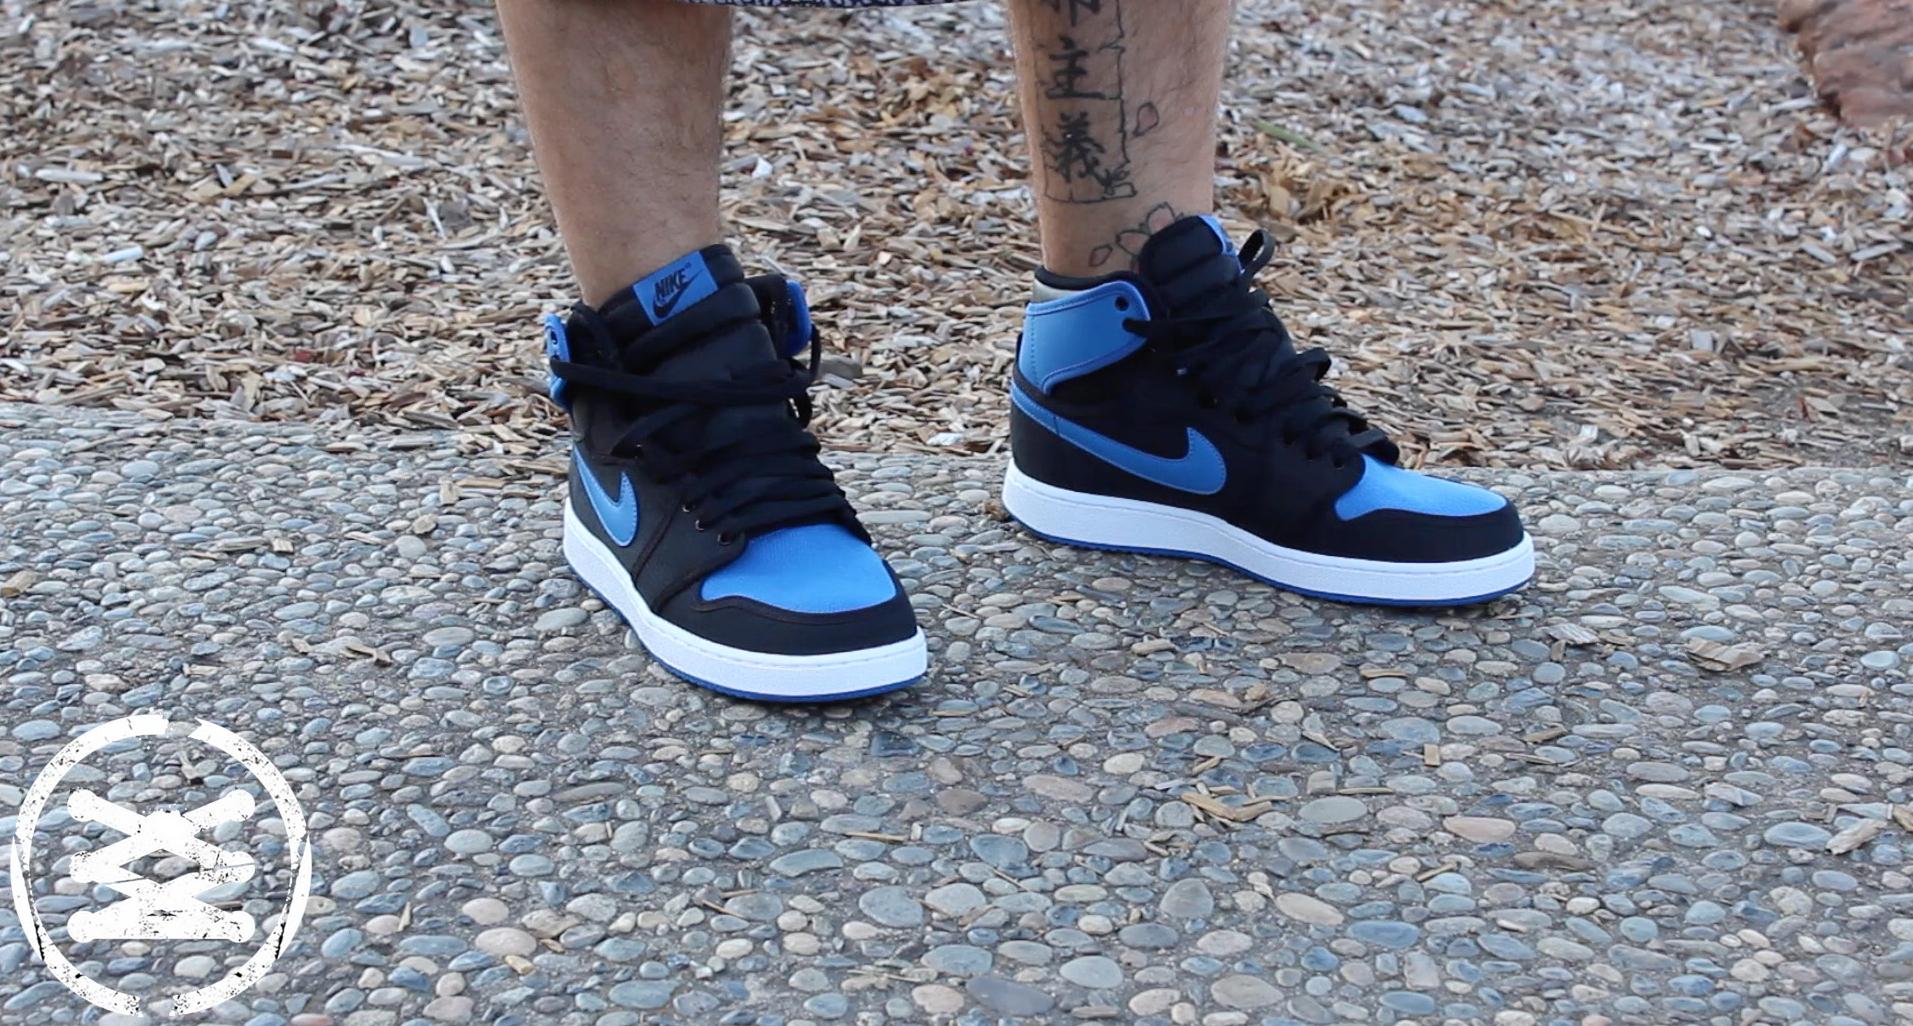 Air Jordan 1 KO Black: Sport Blue – Detailed Look & Review